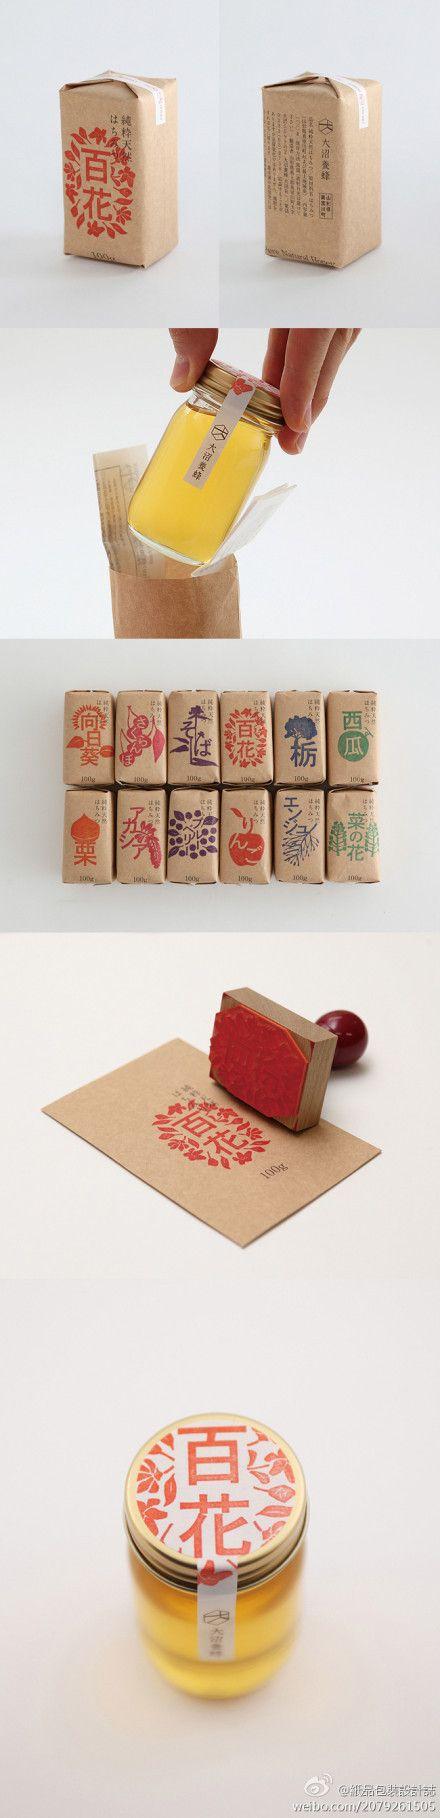 ONUMA HONEY designed by the Japanese in Yamagata Prefecture akaoni design company.